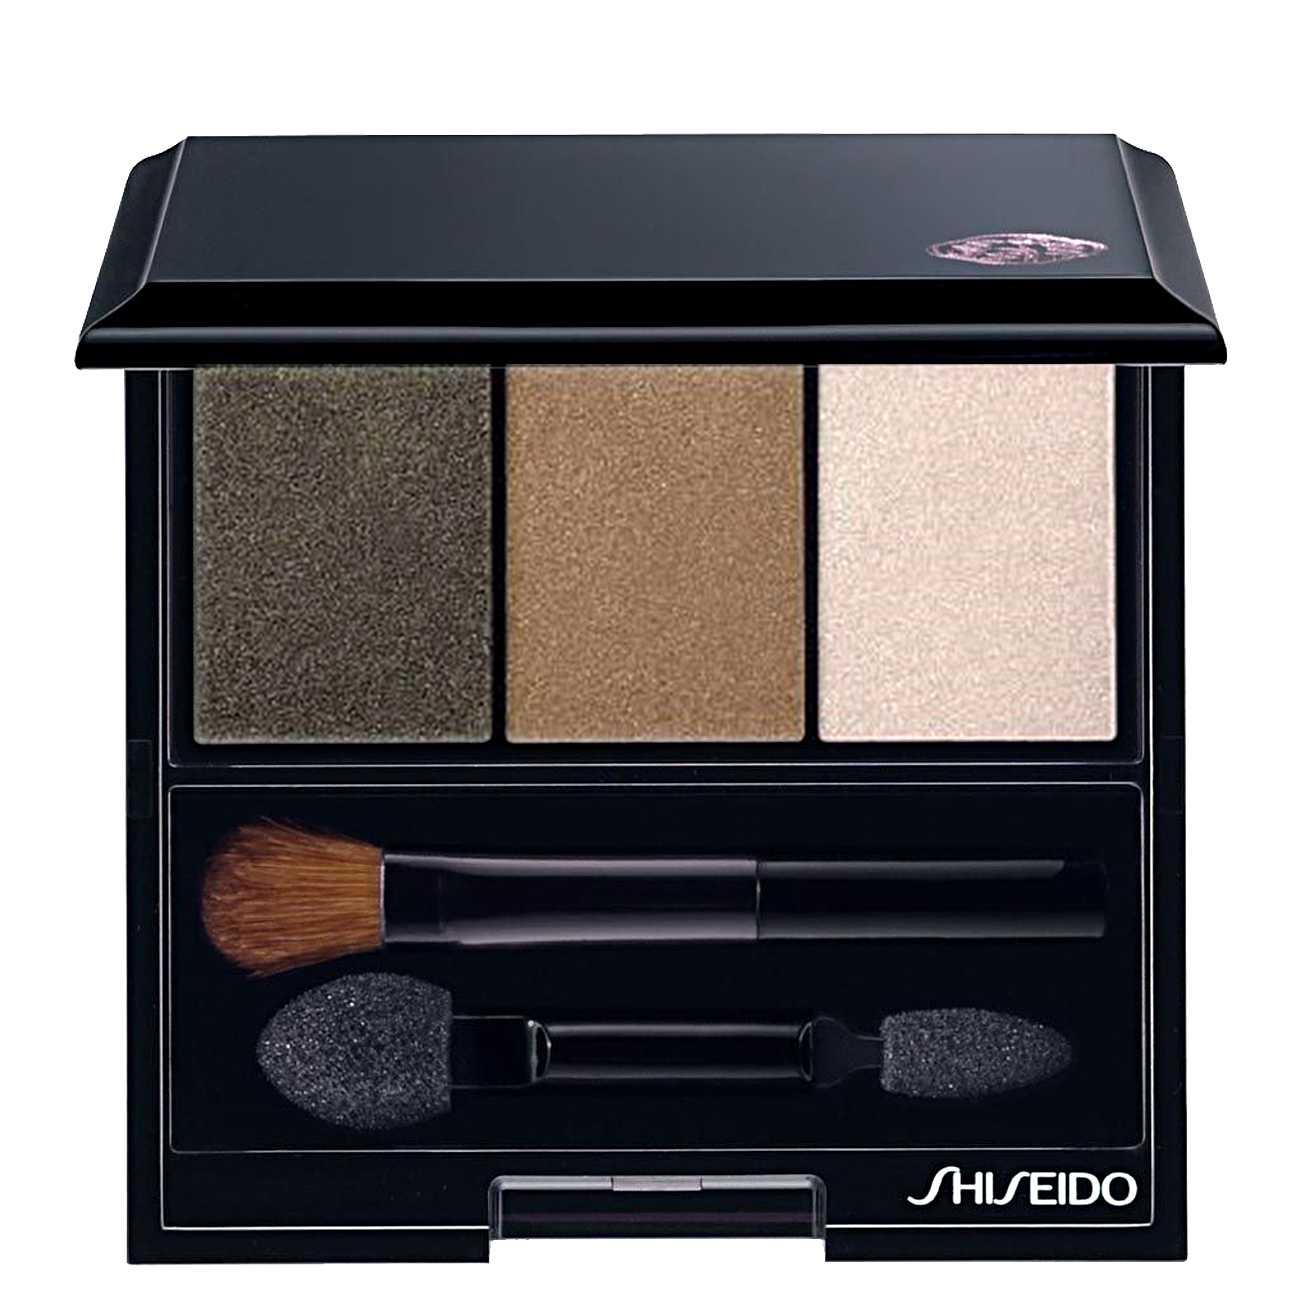 Luminizing Satin Eye Trio 3 G Strata Br307 Shiseido imagine 2021 bestvalue.eu